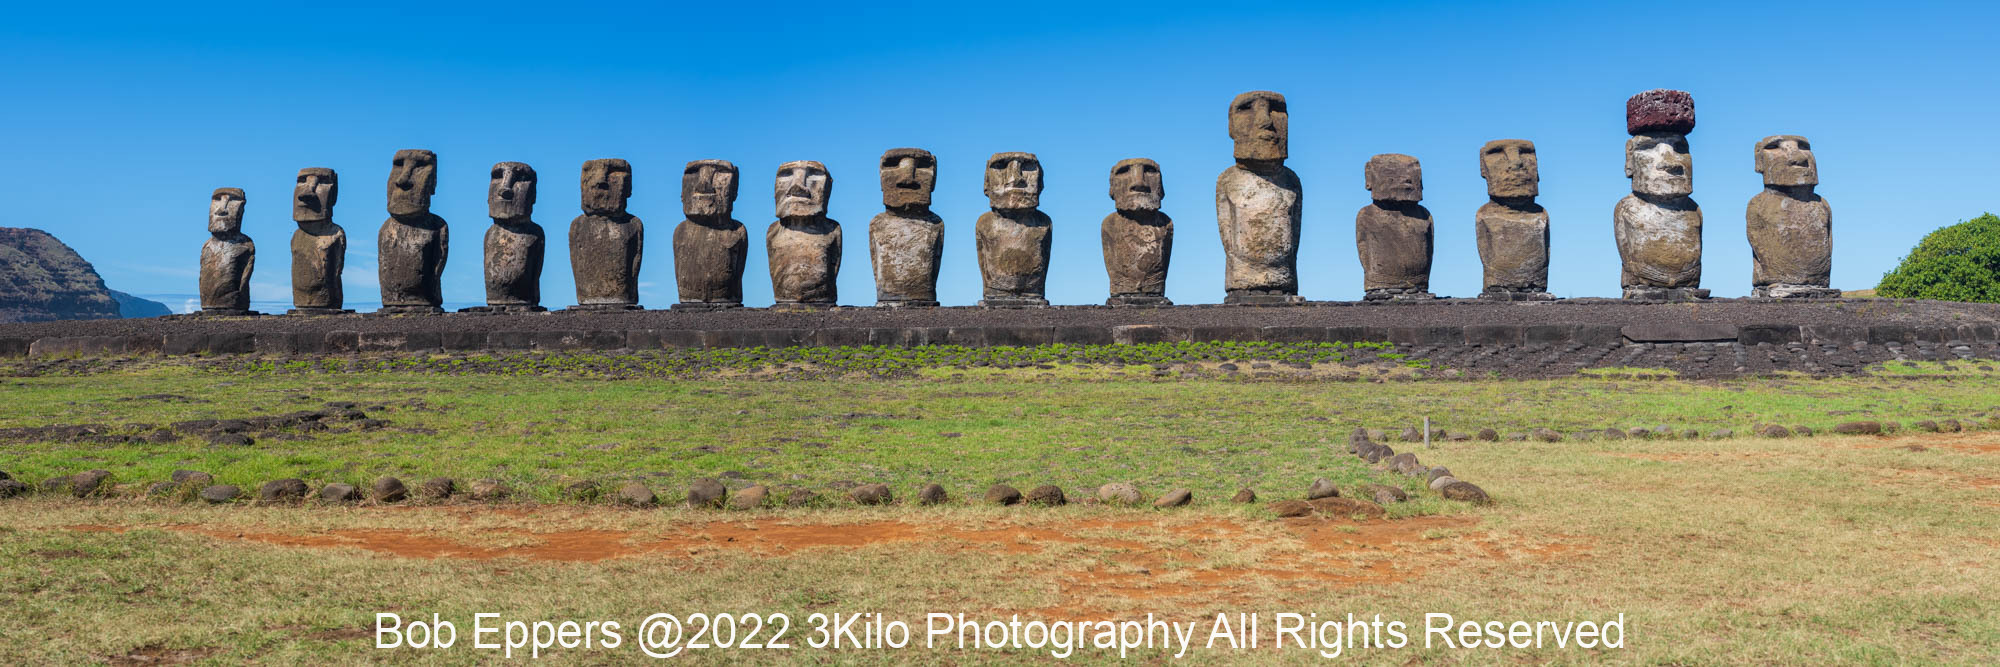 Photo of the 15 Moai on Easter Island